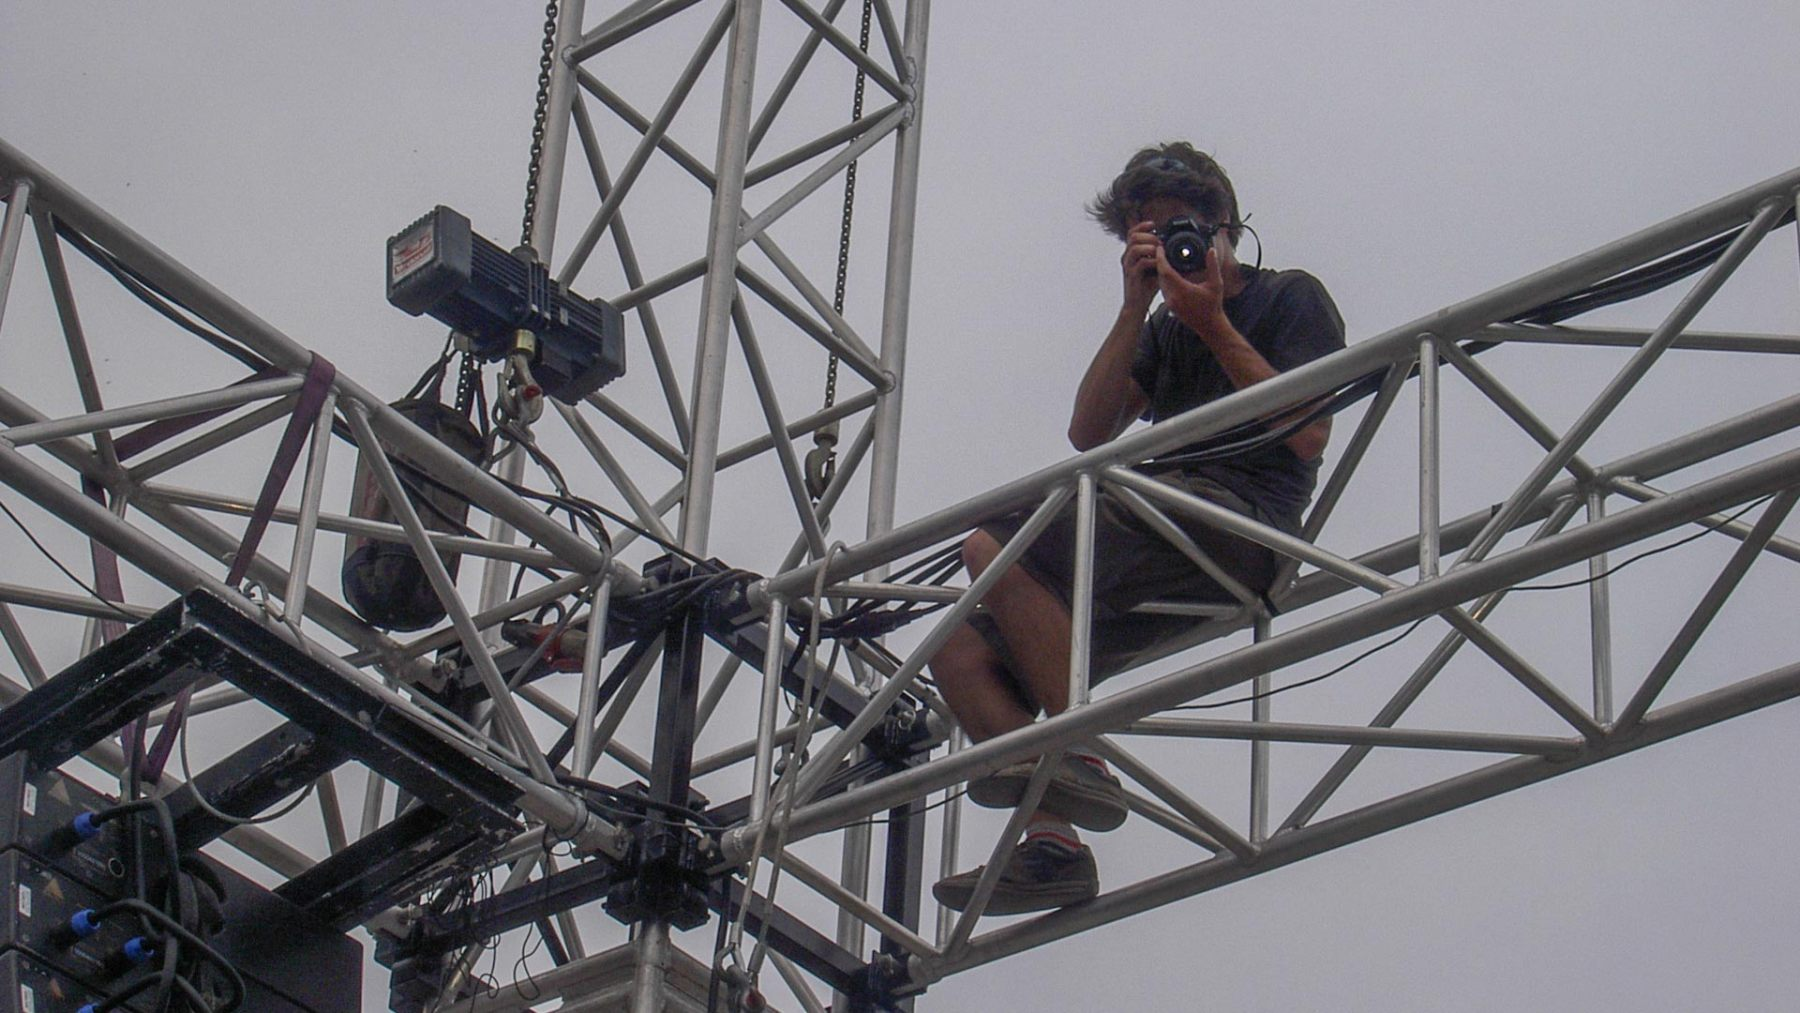 DECIBEL06 - Salons Expositions - Sound-Light-Video à CANNES NICE MONACO ANTIBES